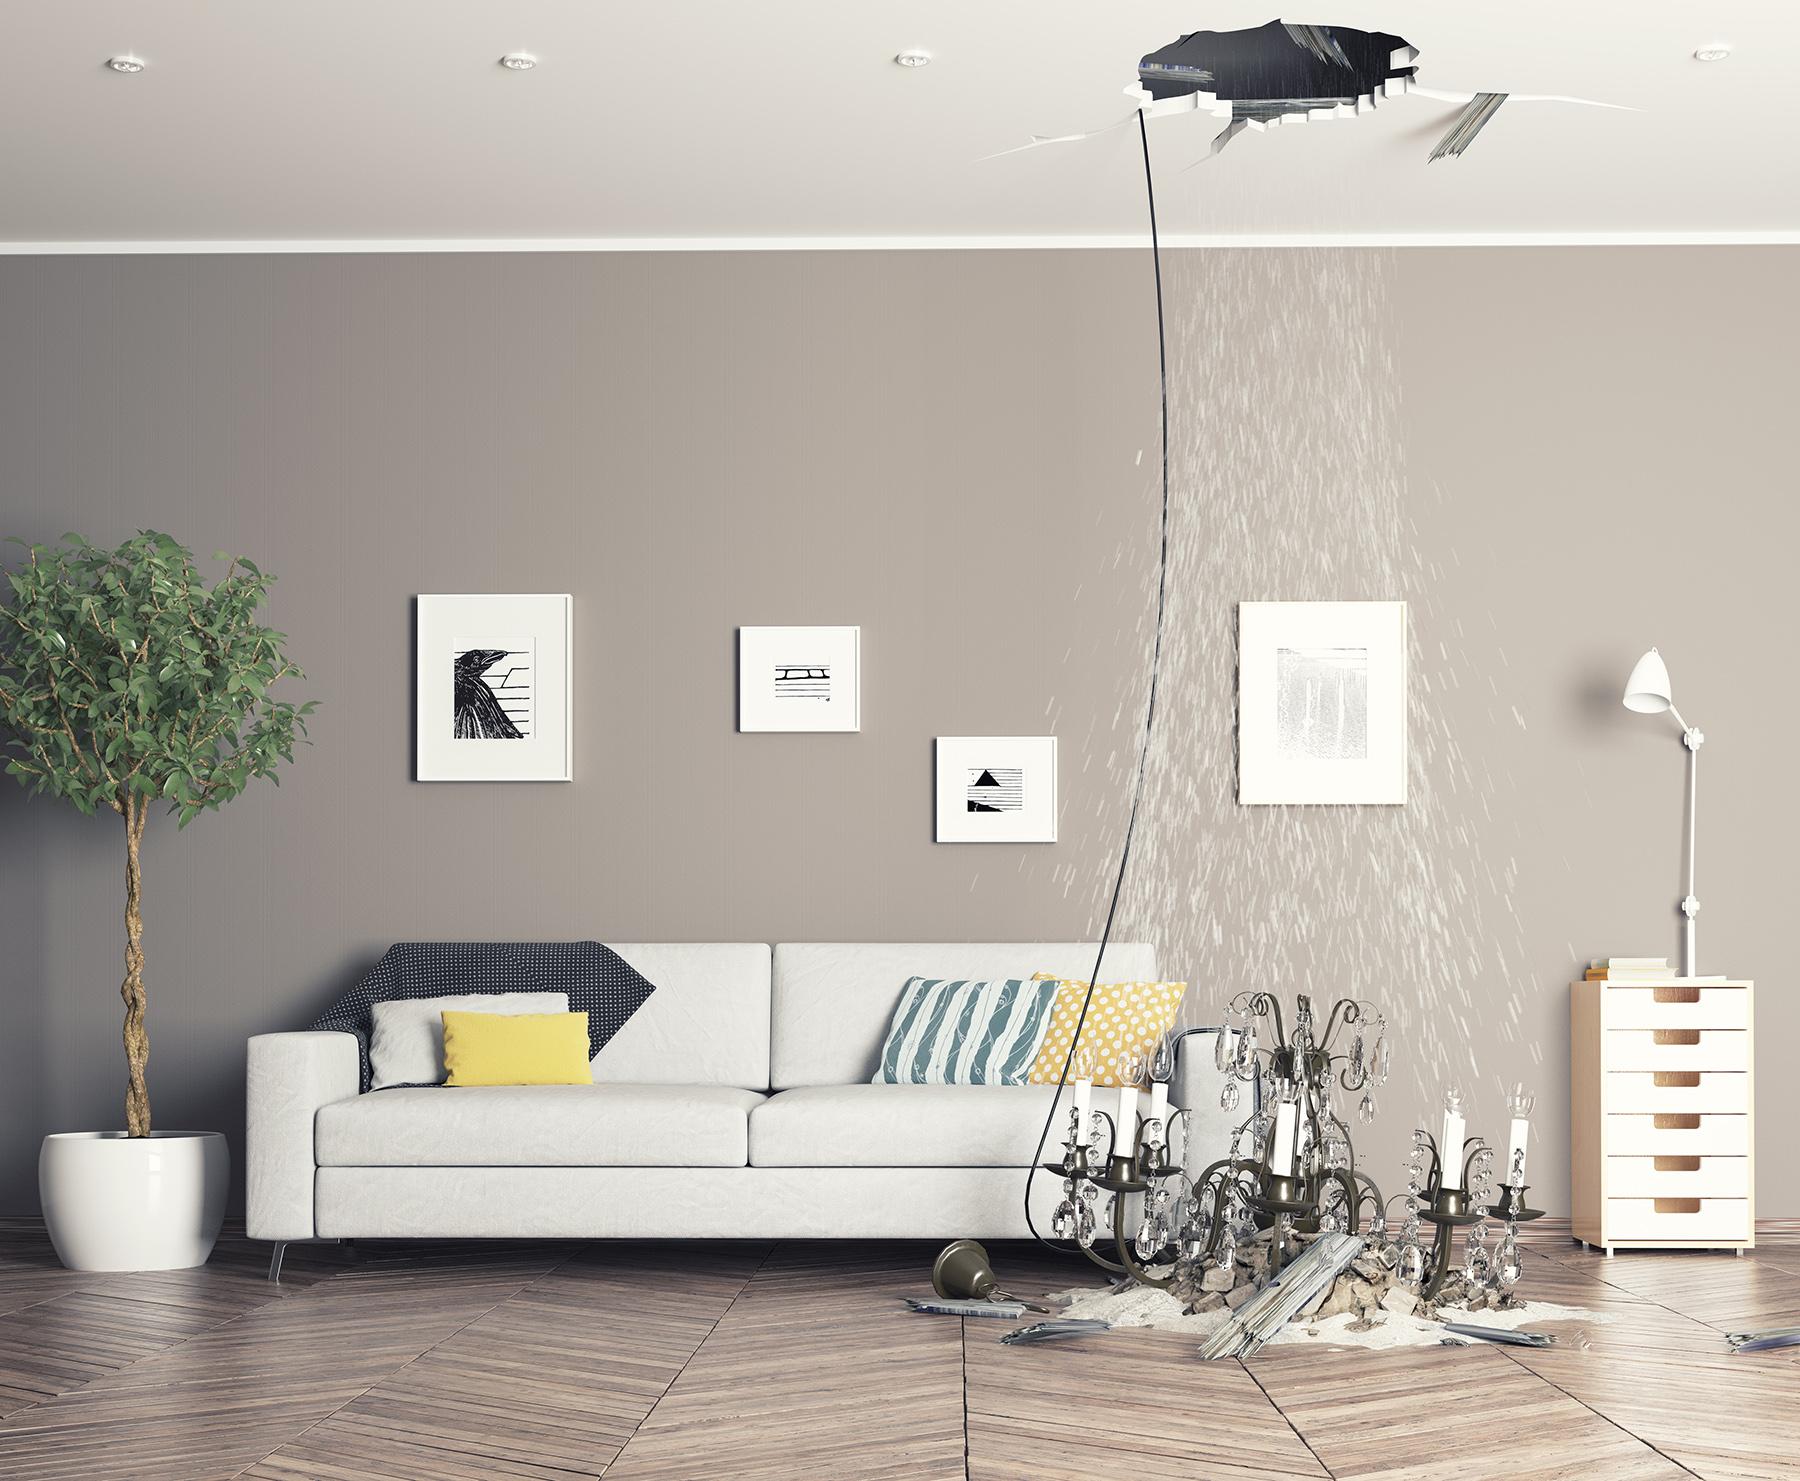 Home insurance damage in Austria